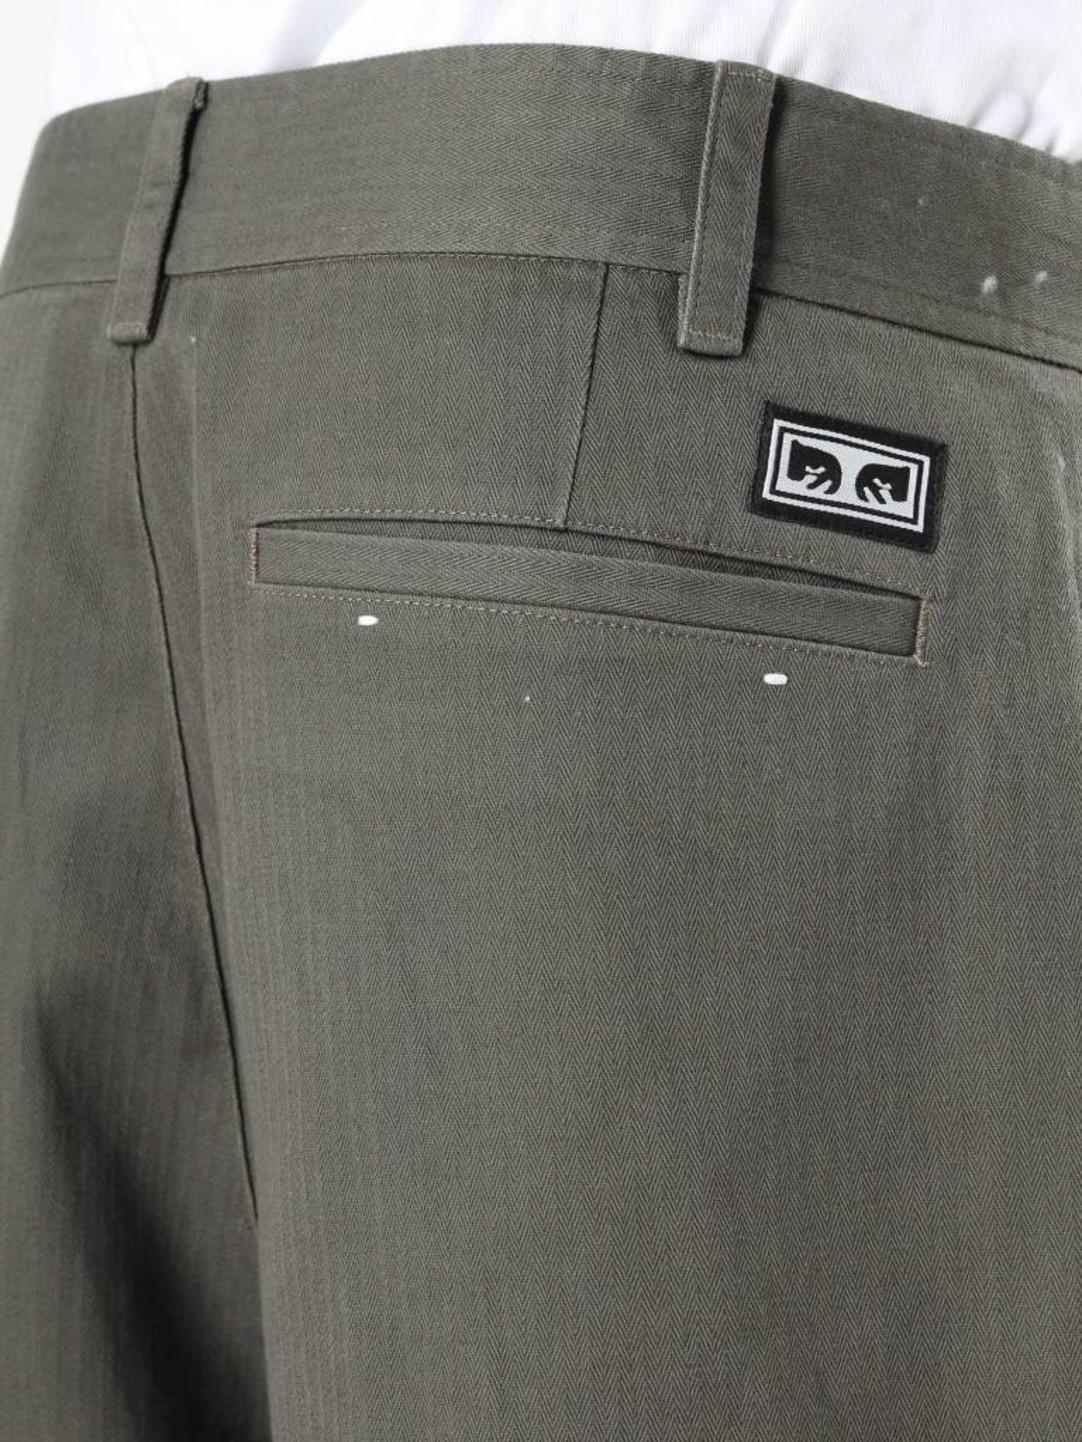 Obey Obey Fubar Big Fits Pant Army 142020101